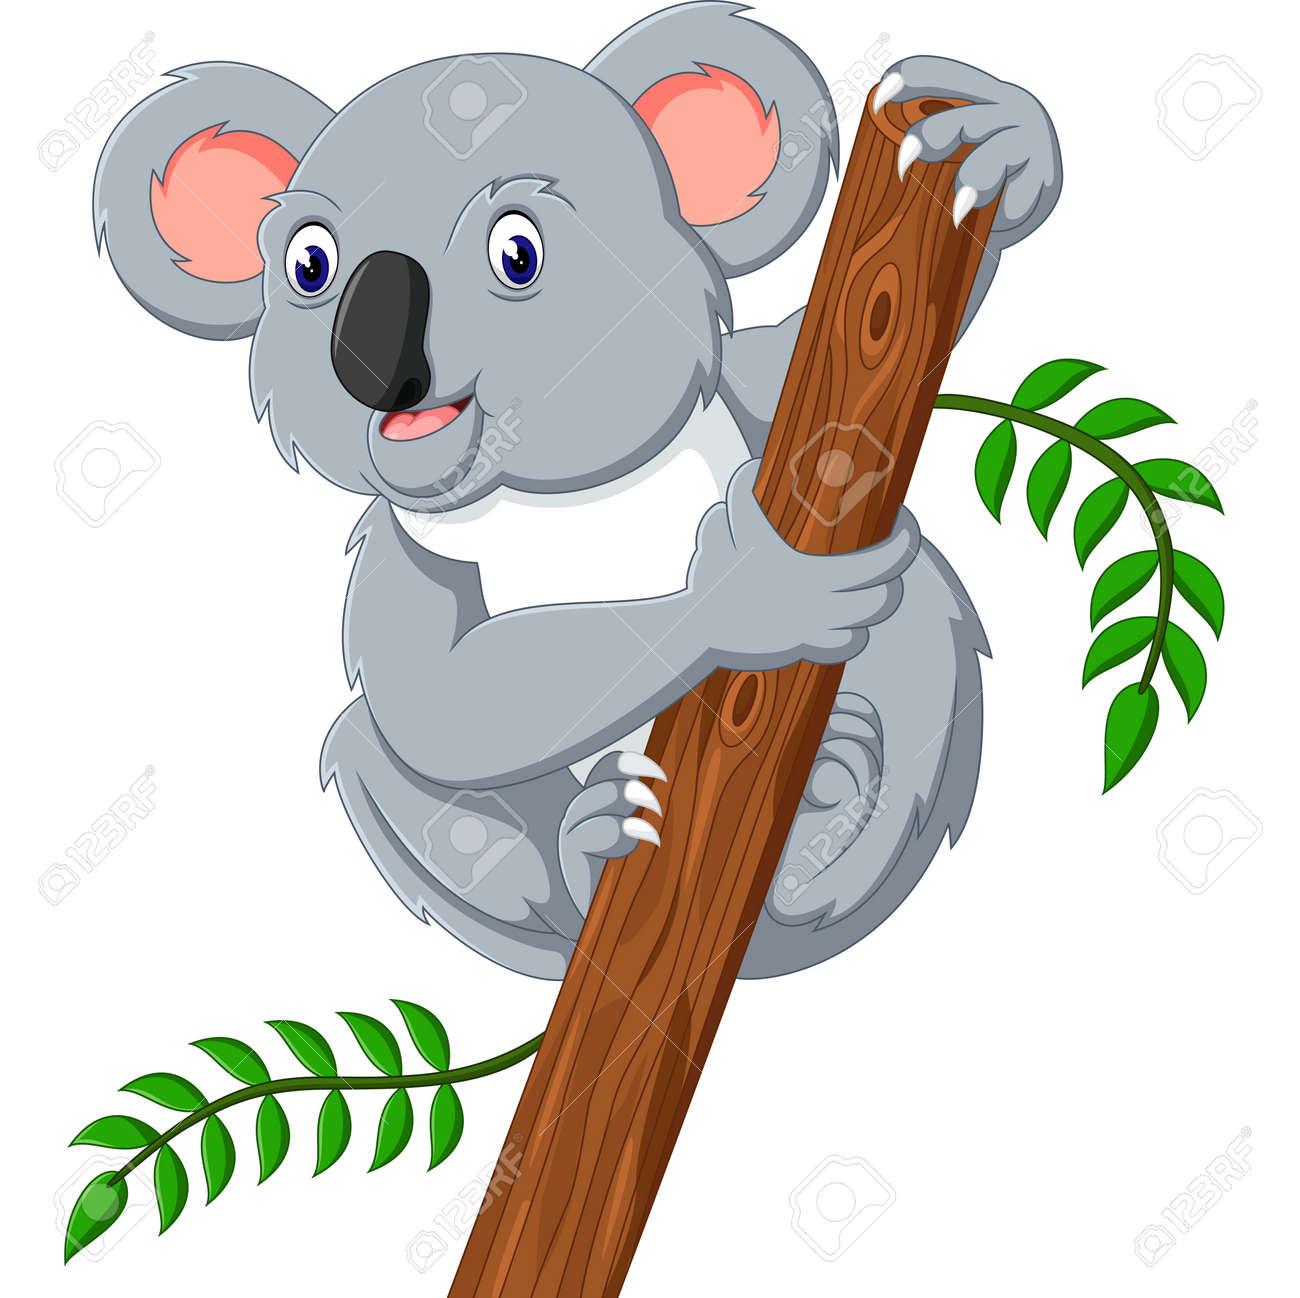 Cute koala holding tree - 50992546